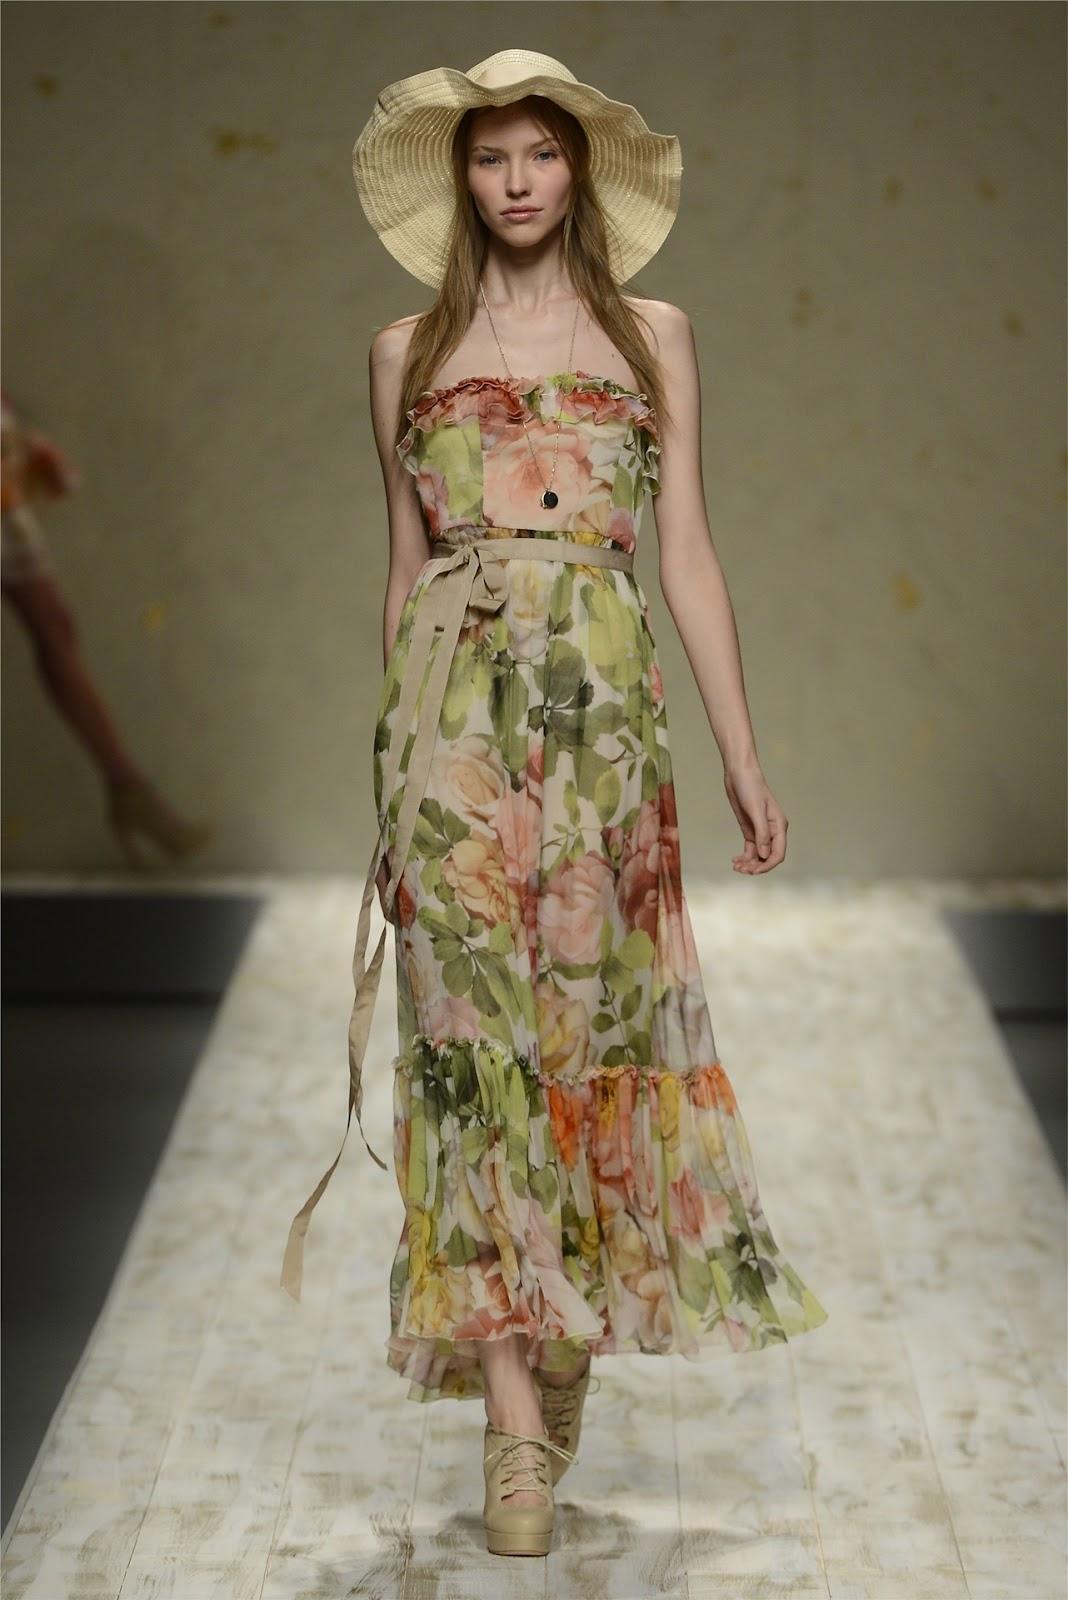 http://1.bp.blogspot.com/-OiMAK8WWGP0/UF74hqgWuxI/AAAAAAAANJQ/2qTLwhL4oPI/s1600/Milano+Fashion+Week+-+Blugirl+(Spring-Summer+2013)+14.jpg